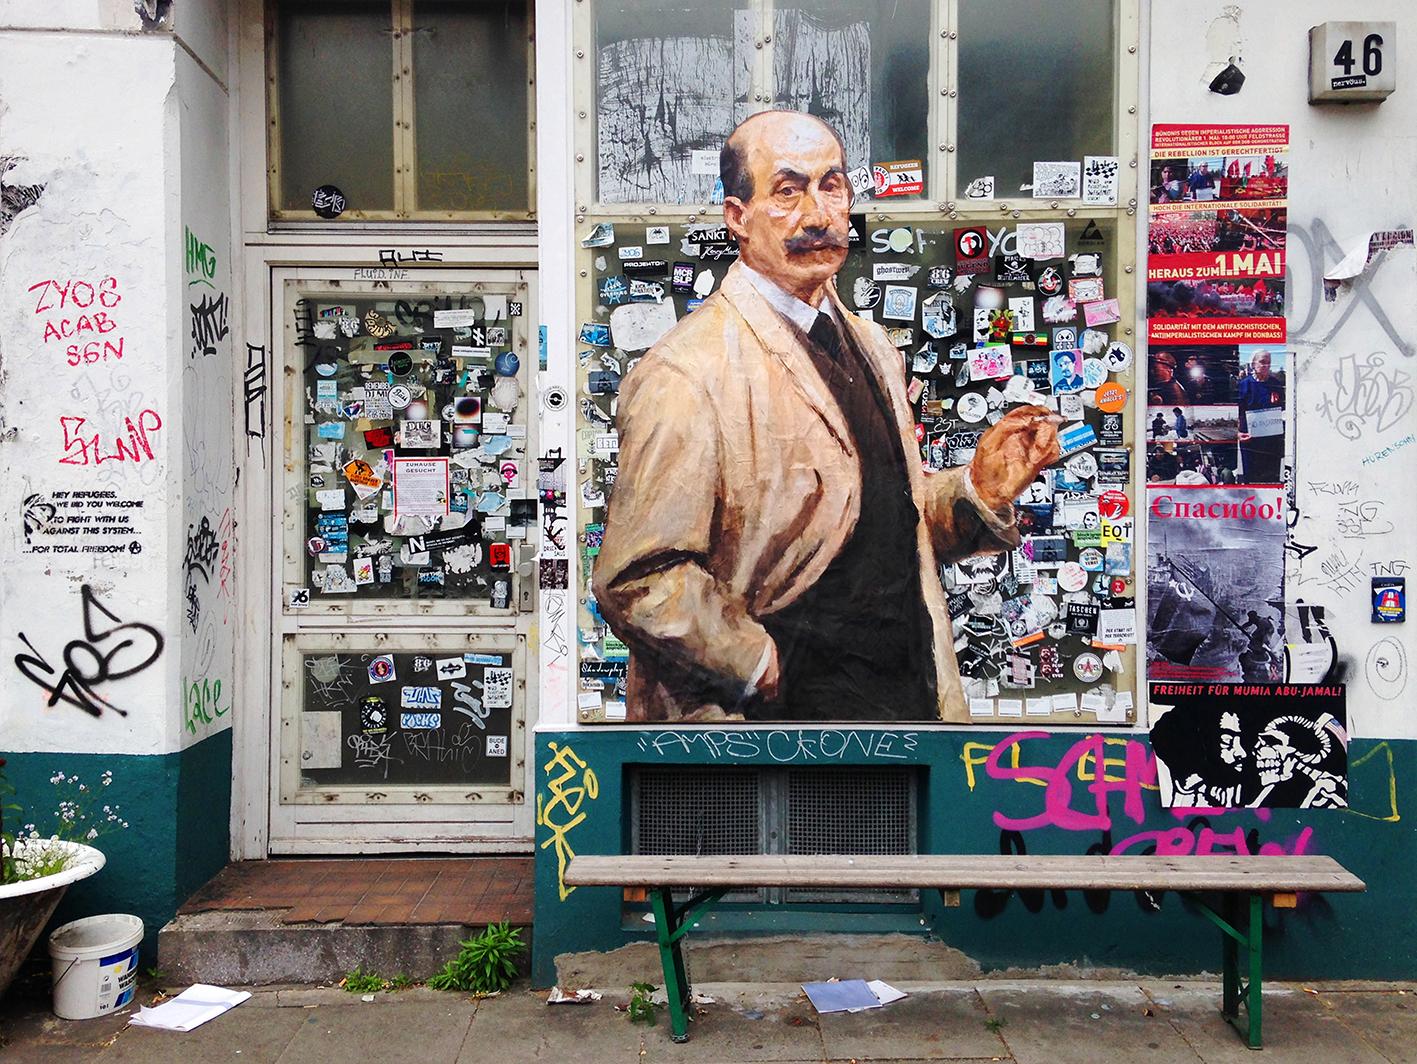 Hambourg, Germany